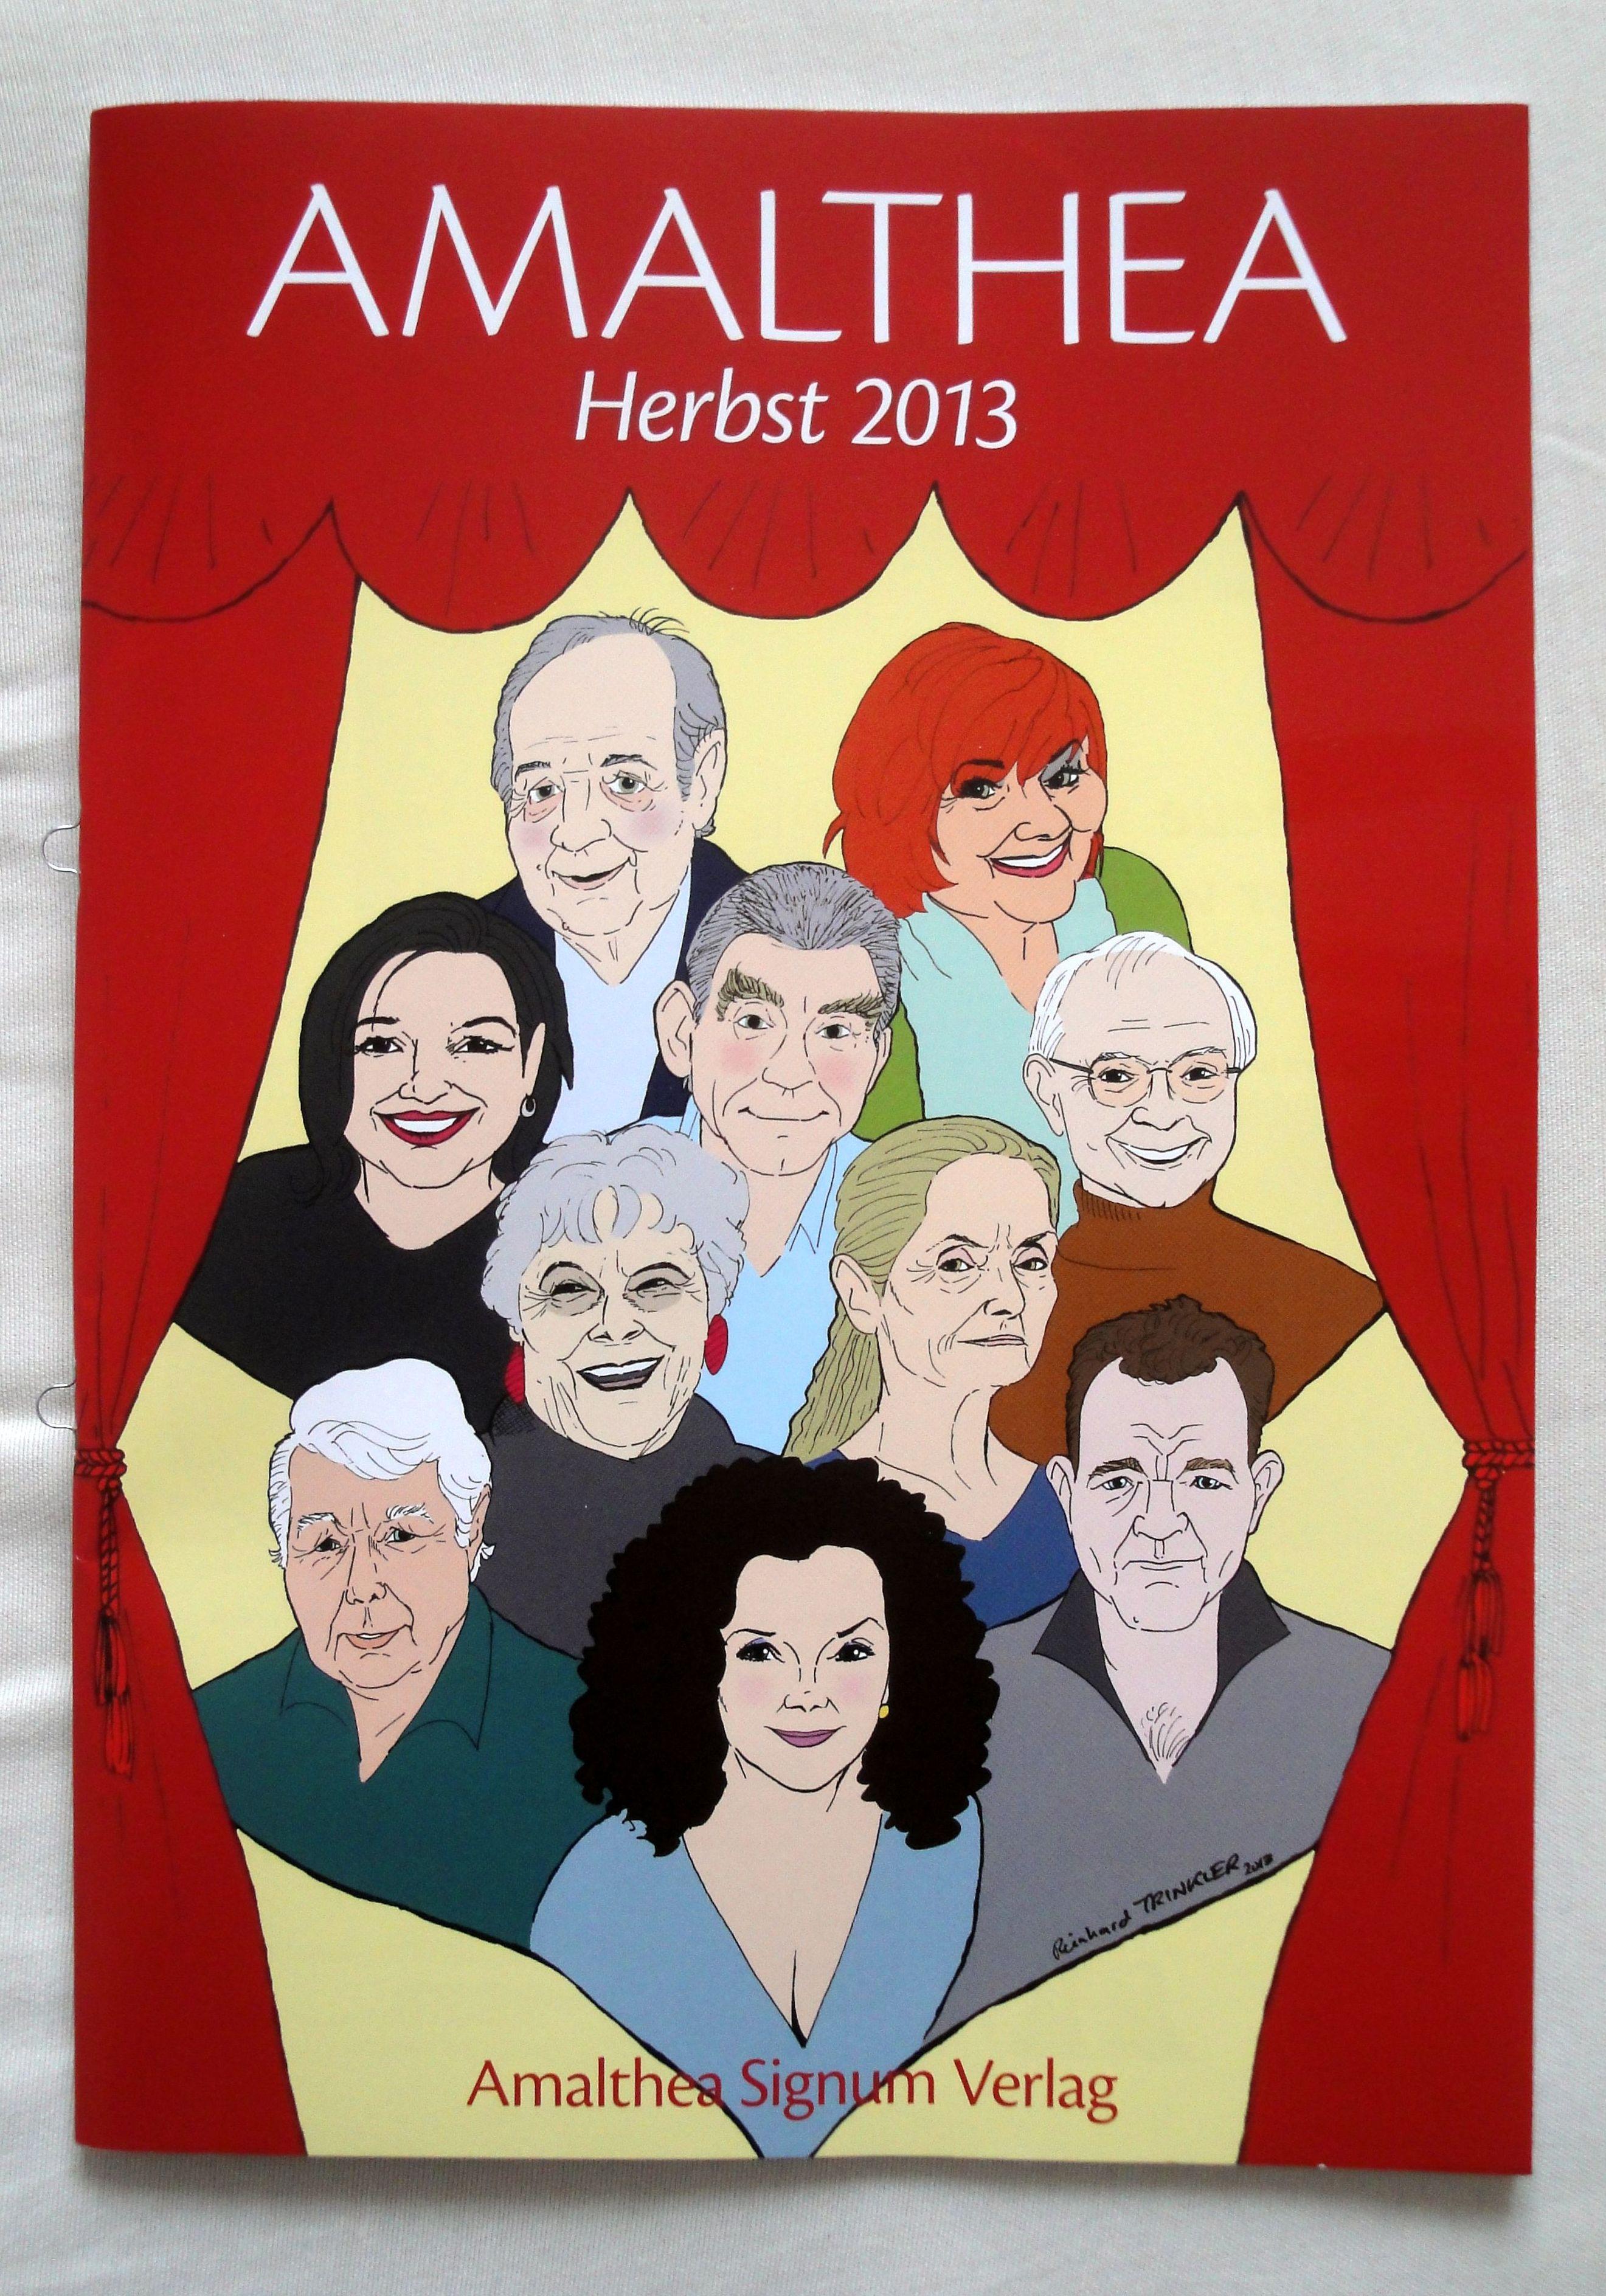 AMALTHEA Herbstkatalog 2013 / Umschlagabbildung: Reinhard Trinkler